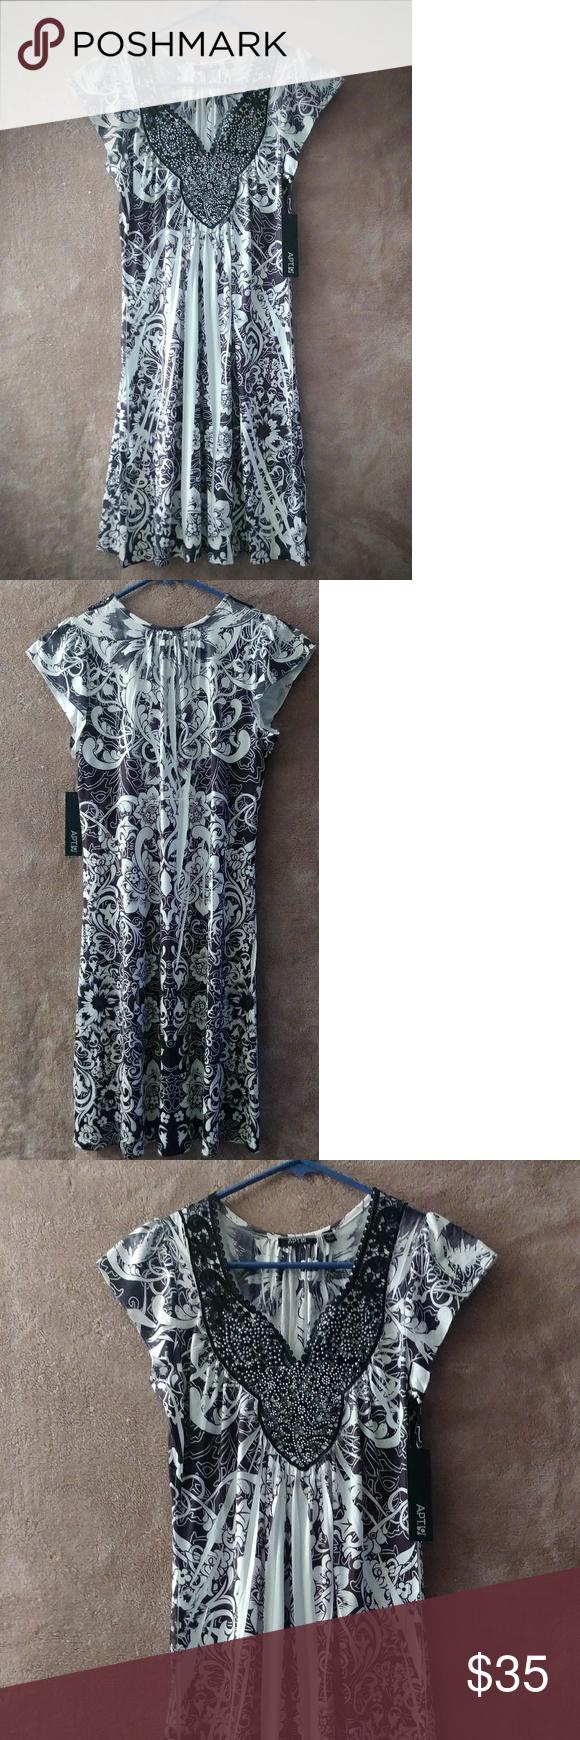 Apt 9 Black & White Dress Size XS Apt 9 Black